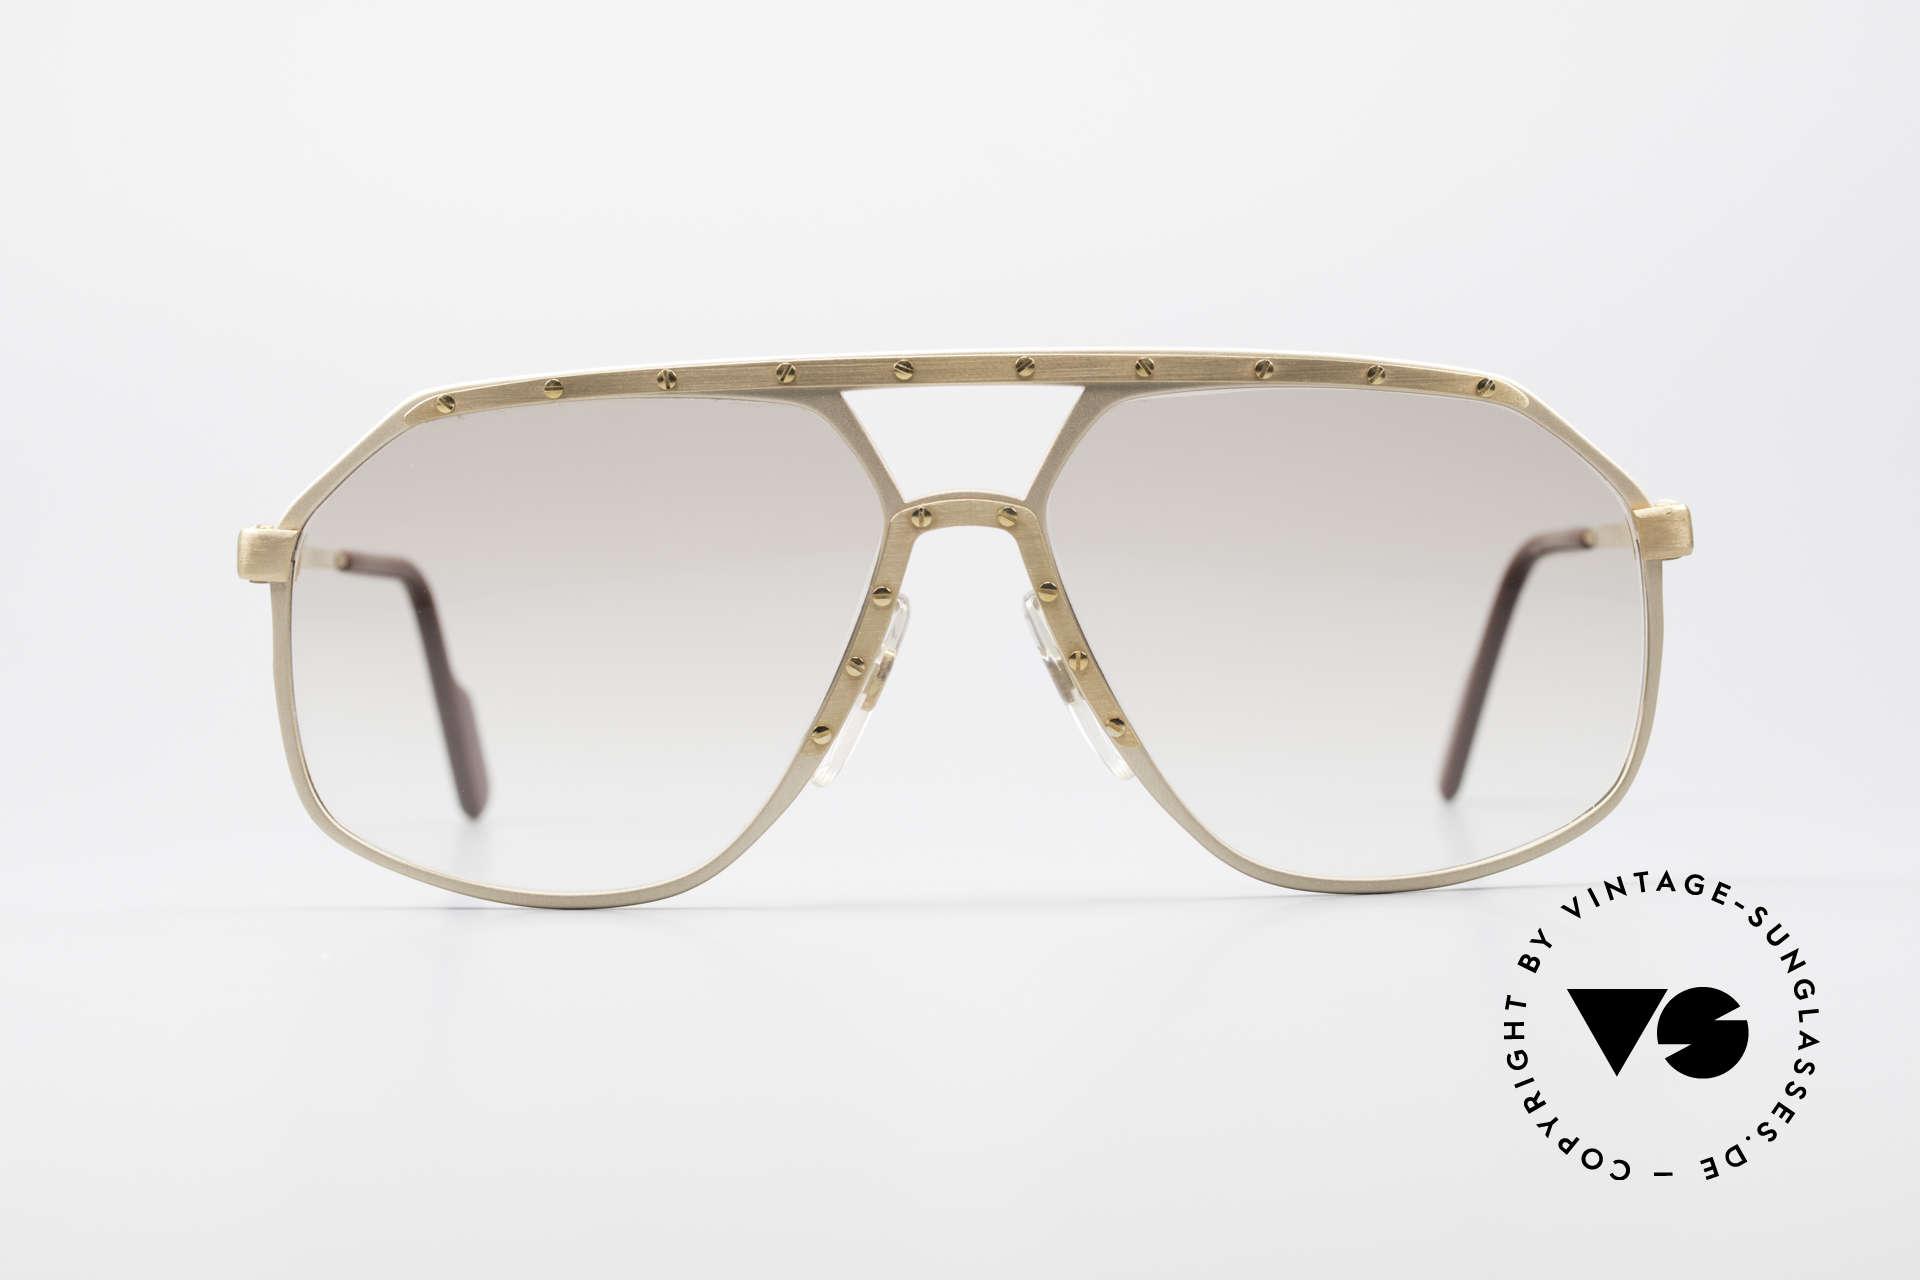 Alpina M6 Old 80's Shades True Vintage, a precious old 80's original in medium size 60-14, Made for Men